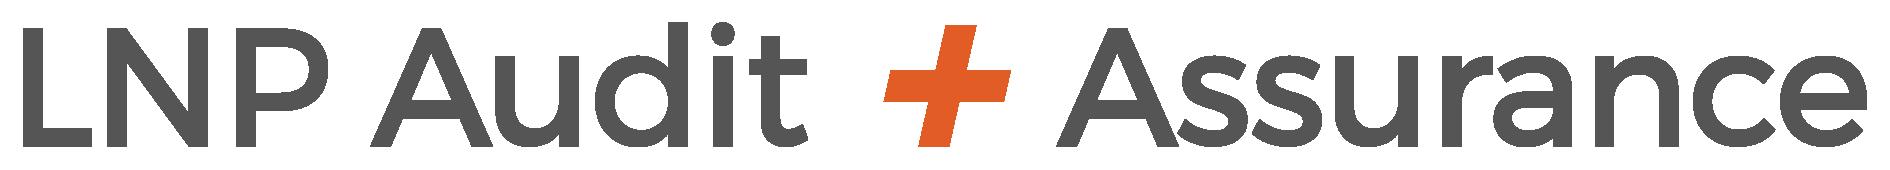 LNP_Audit_+_Ass_Logo_RGB.png